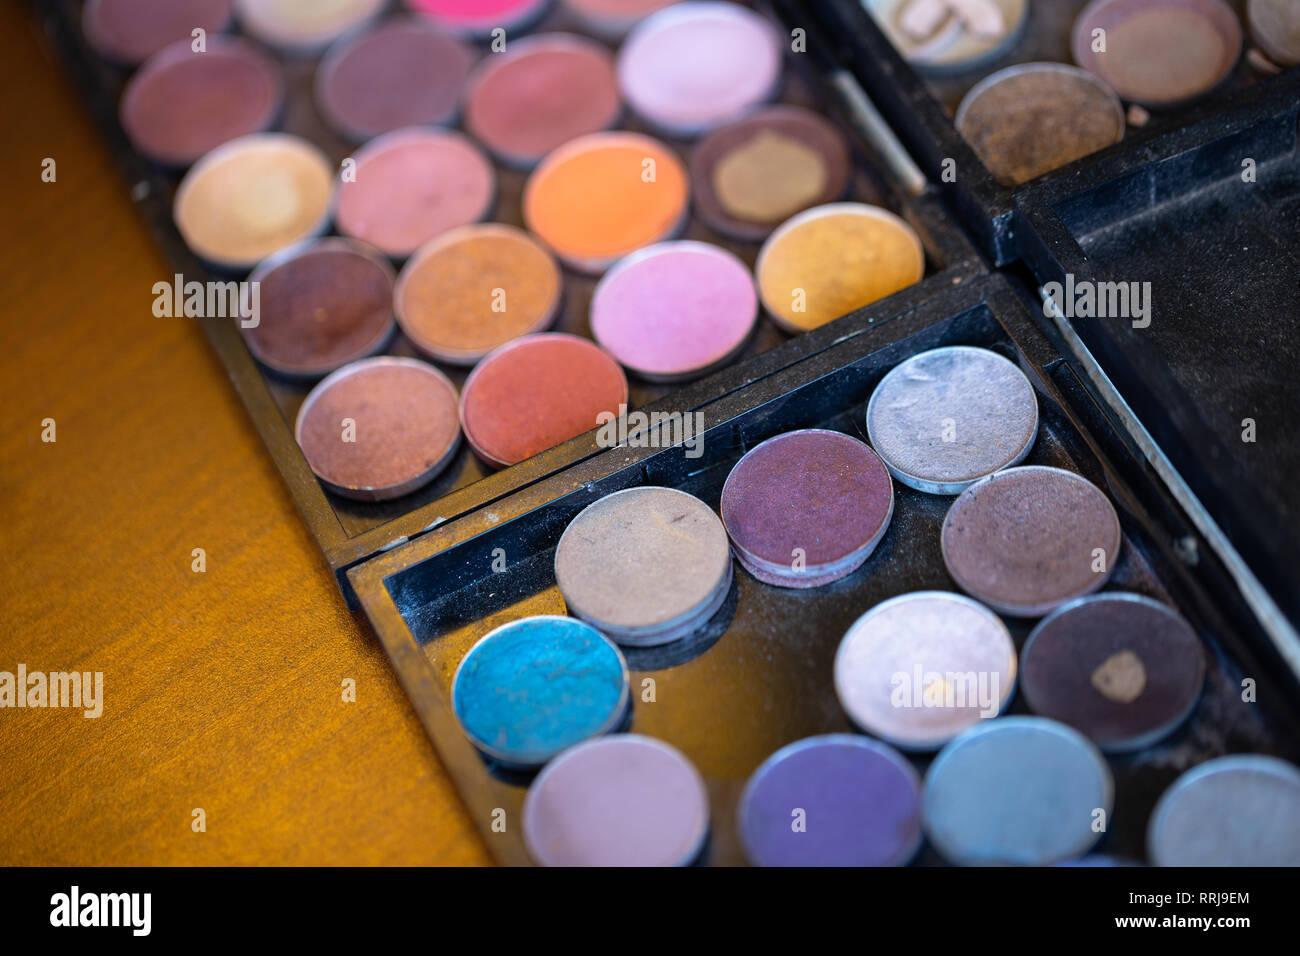 Makeup artist color palette - Stock Image